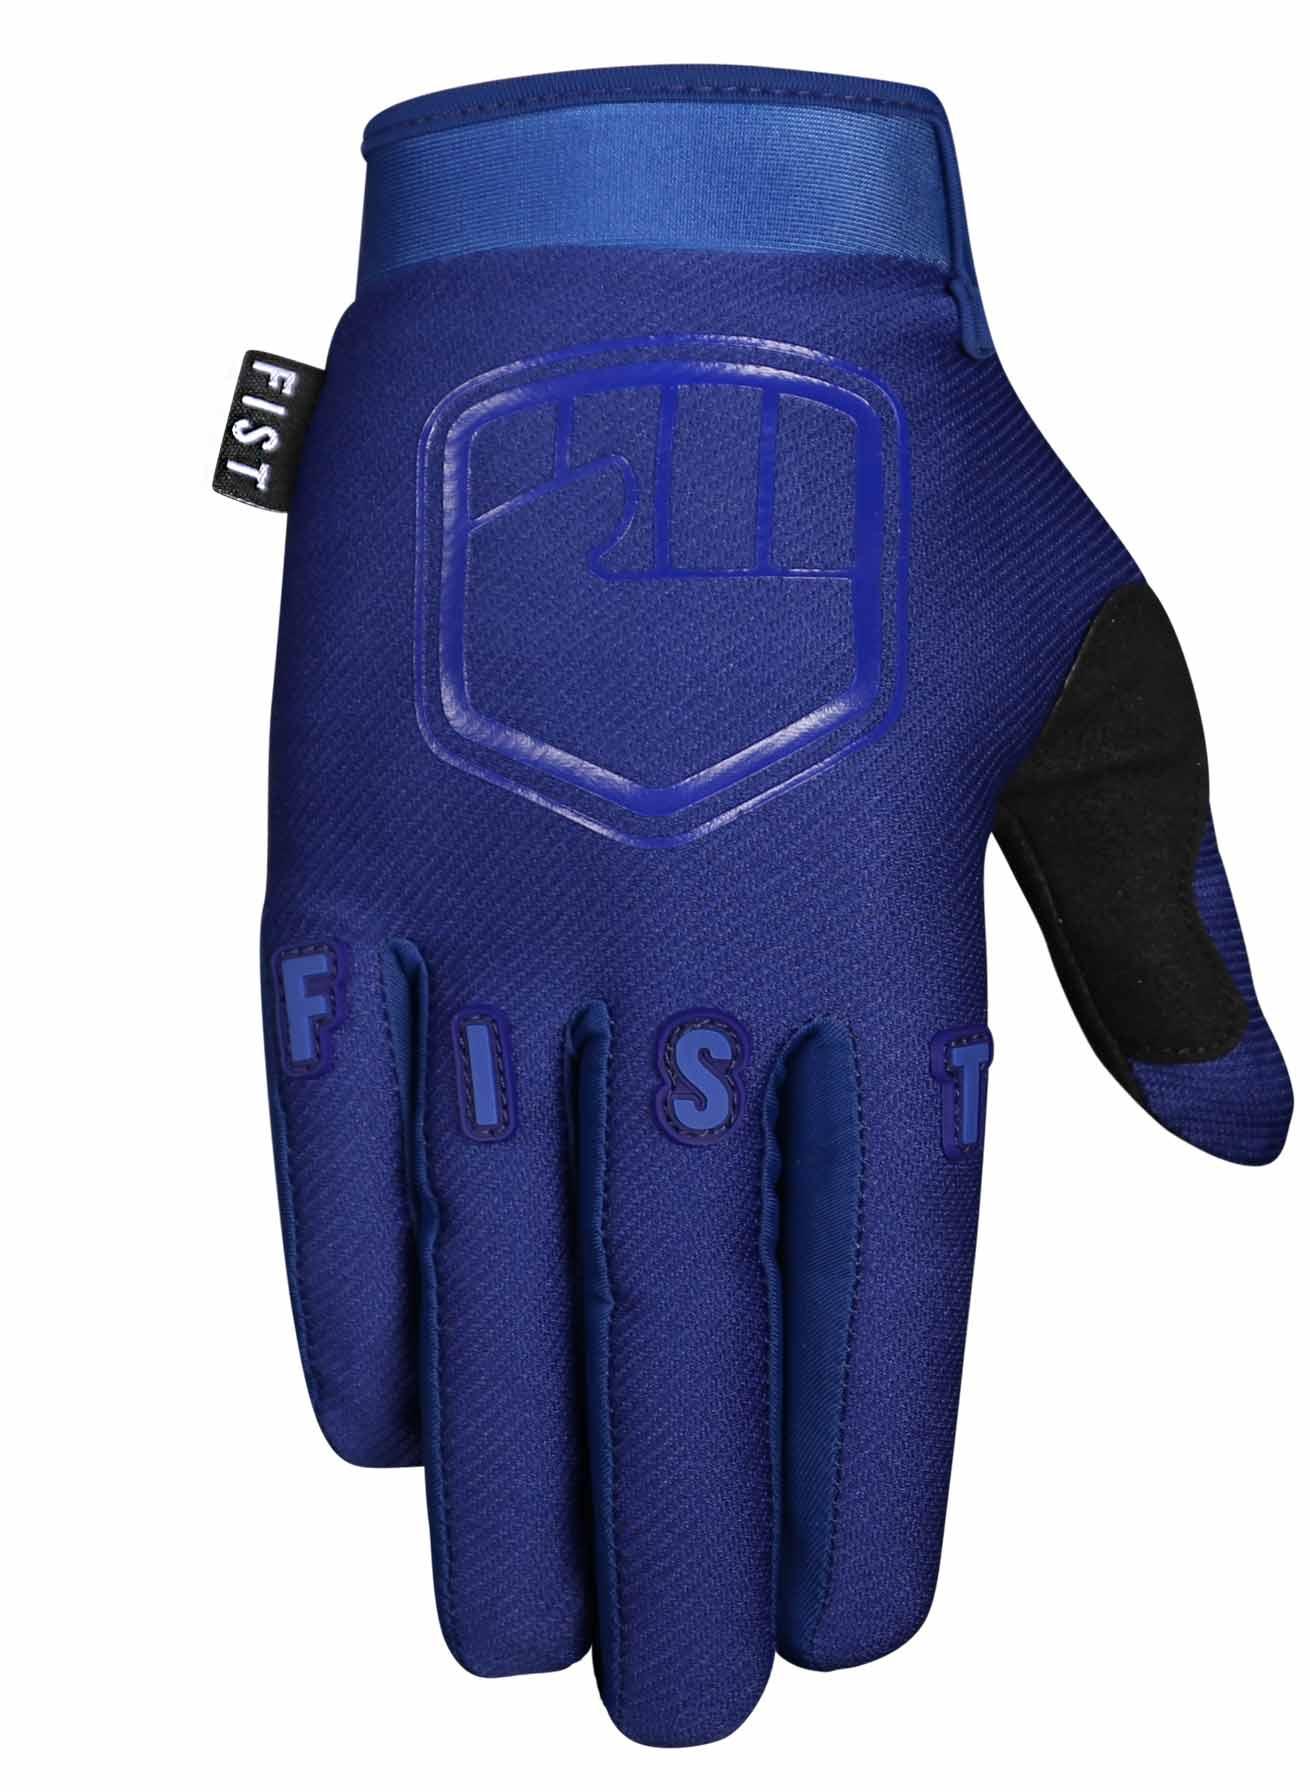 Fist Youth Blue Stocker Gloves